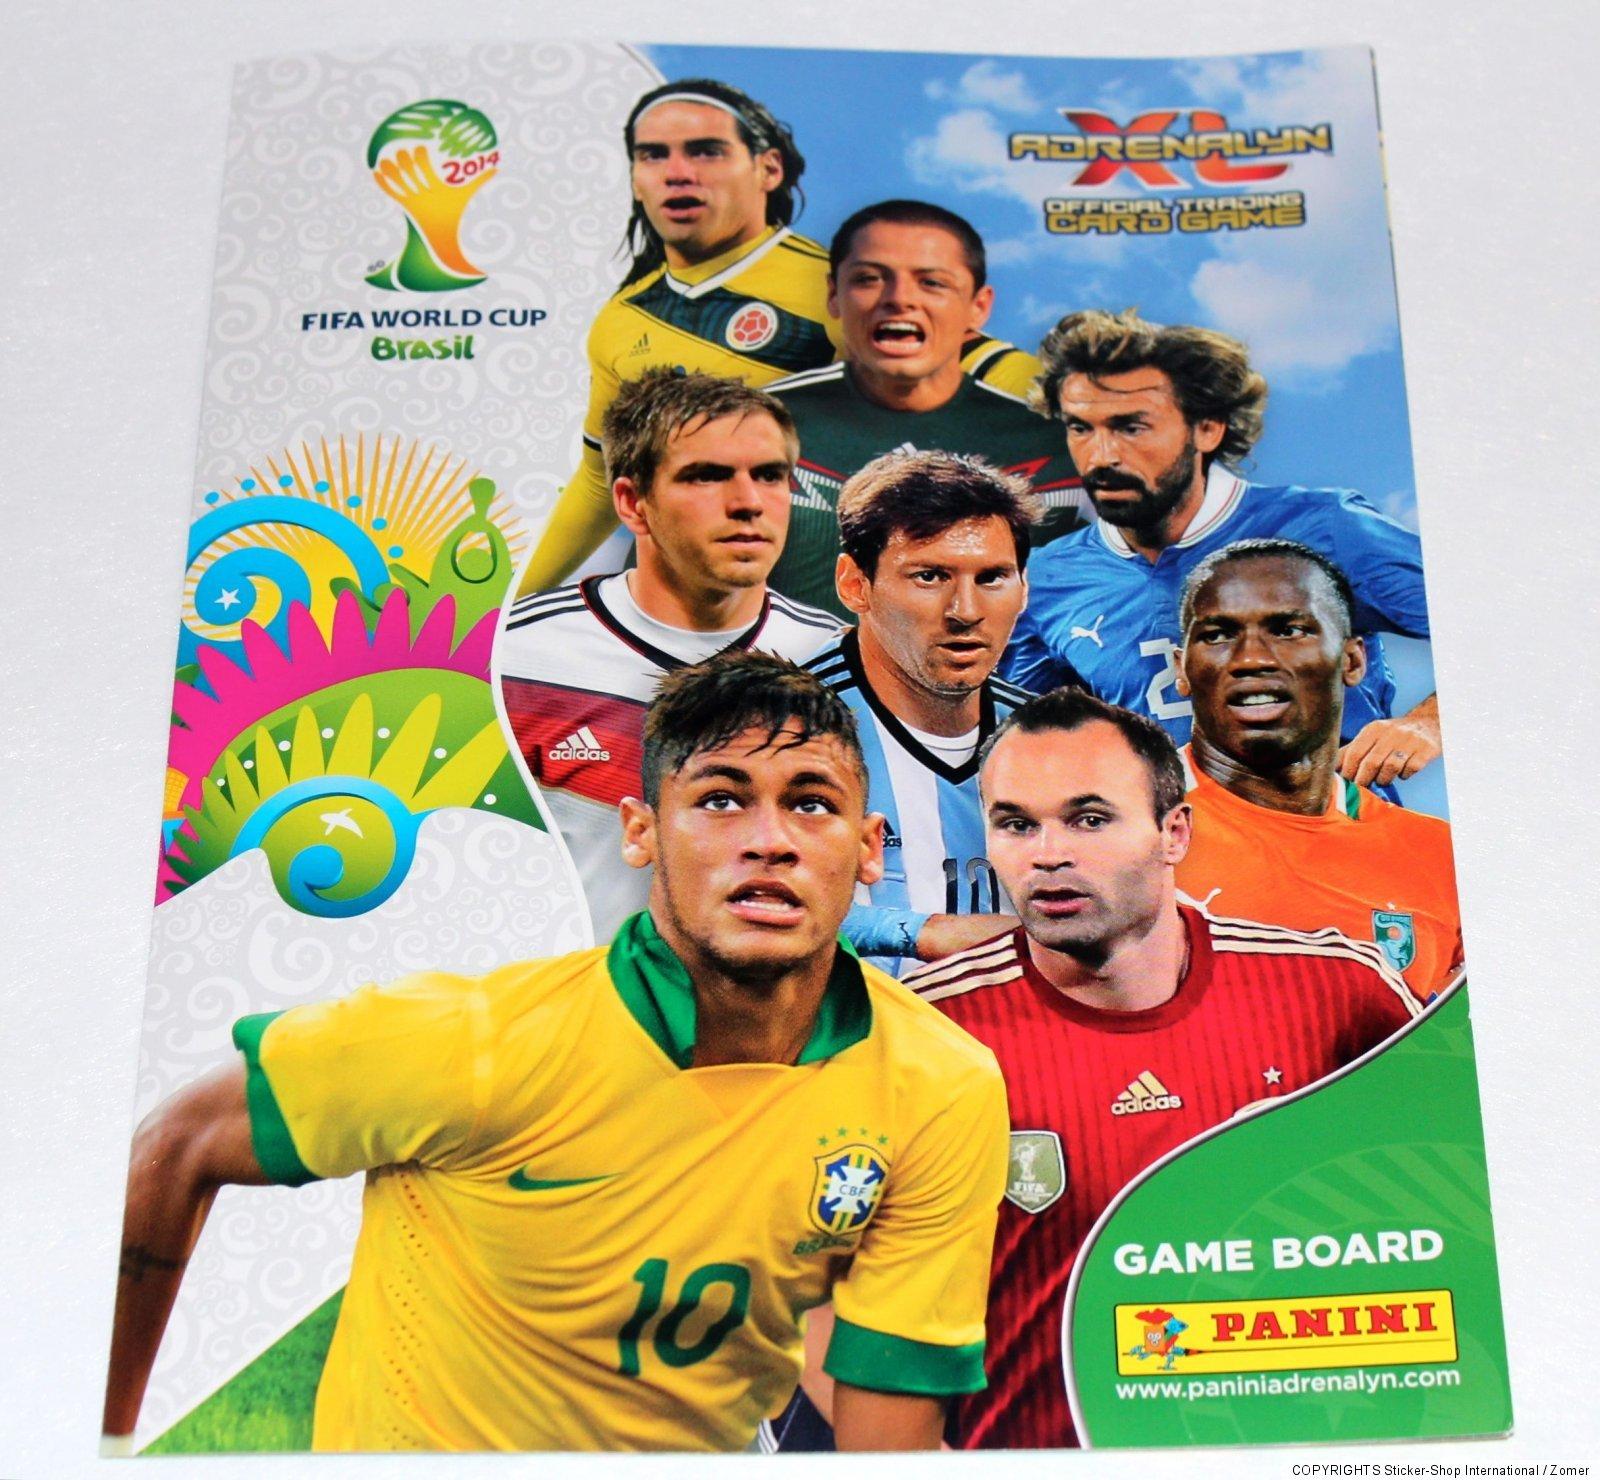 Adrenalyn Coupe du monde World cup 2010 265 Vincent Enyeama Nigeria Goal Stopper UK Edition